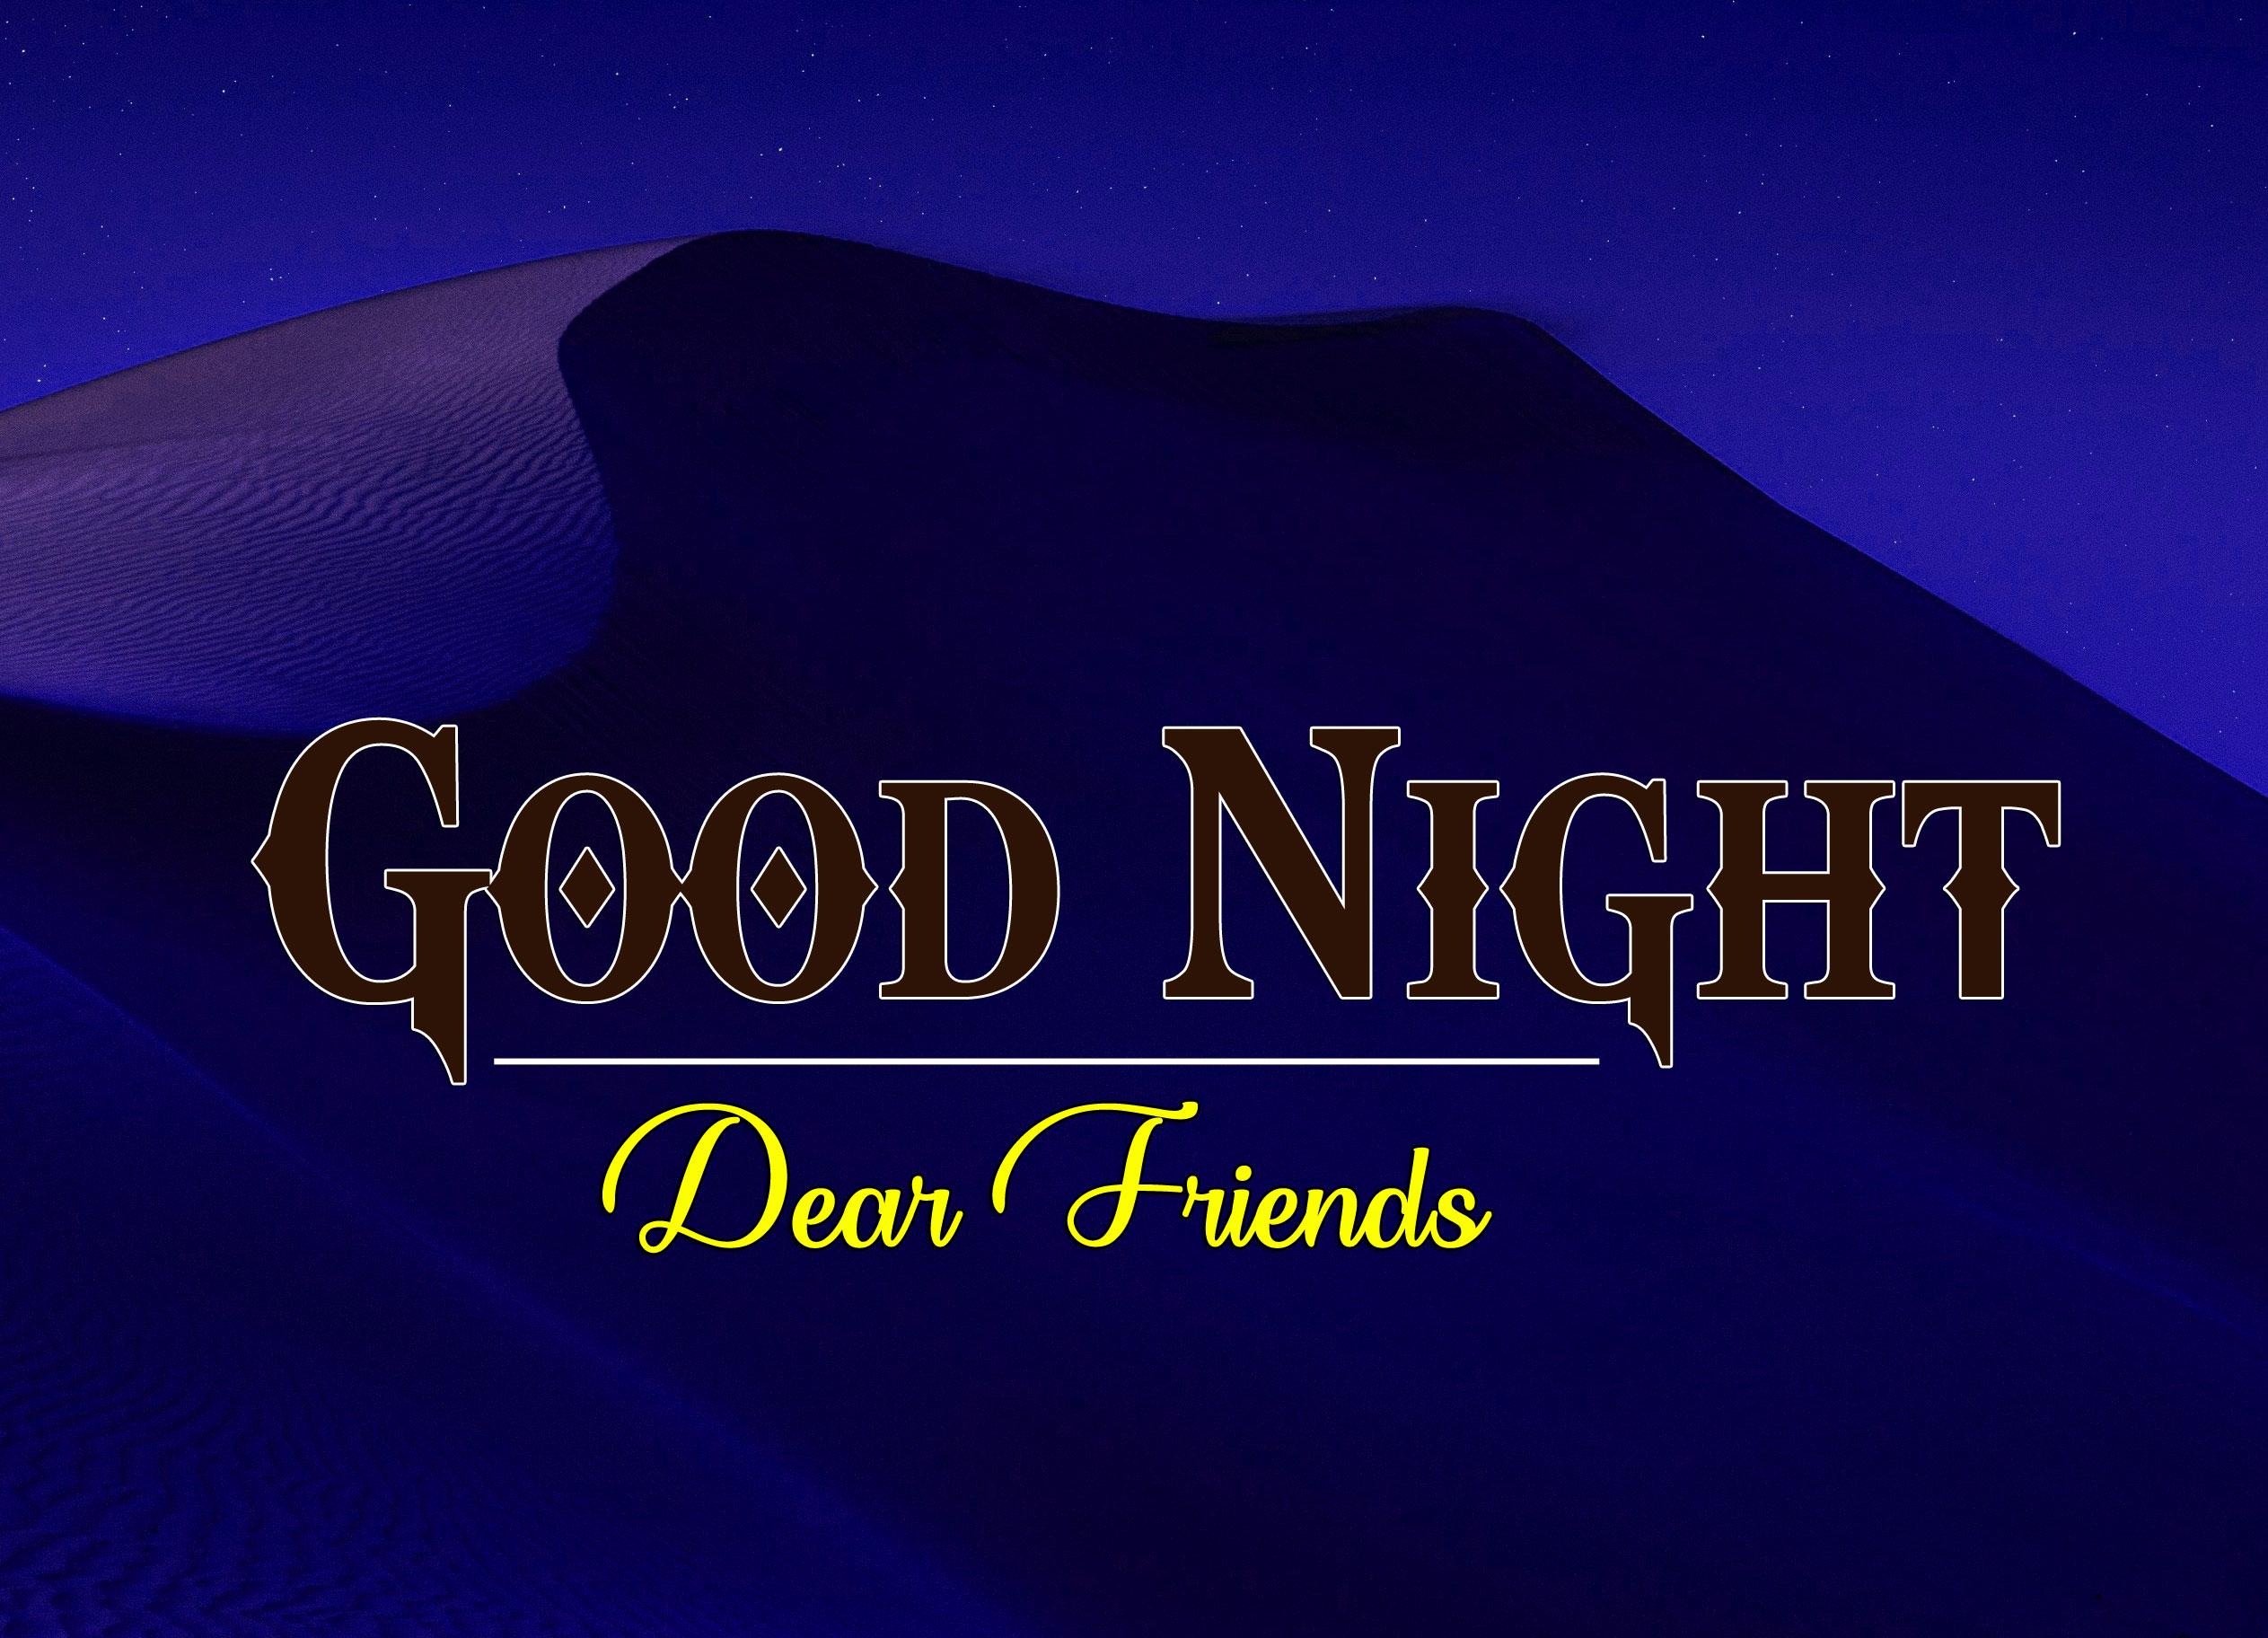 Good Night Wishes k Images Photo Free